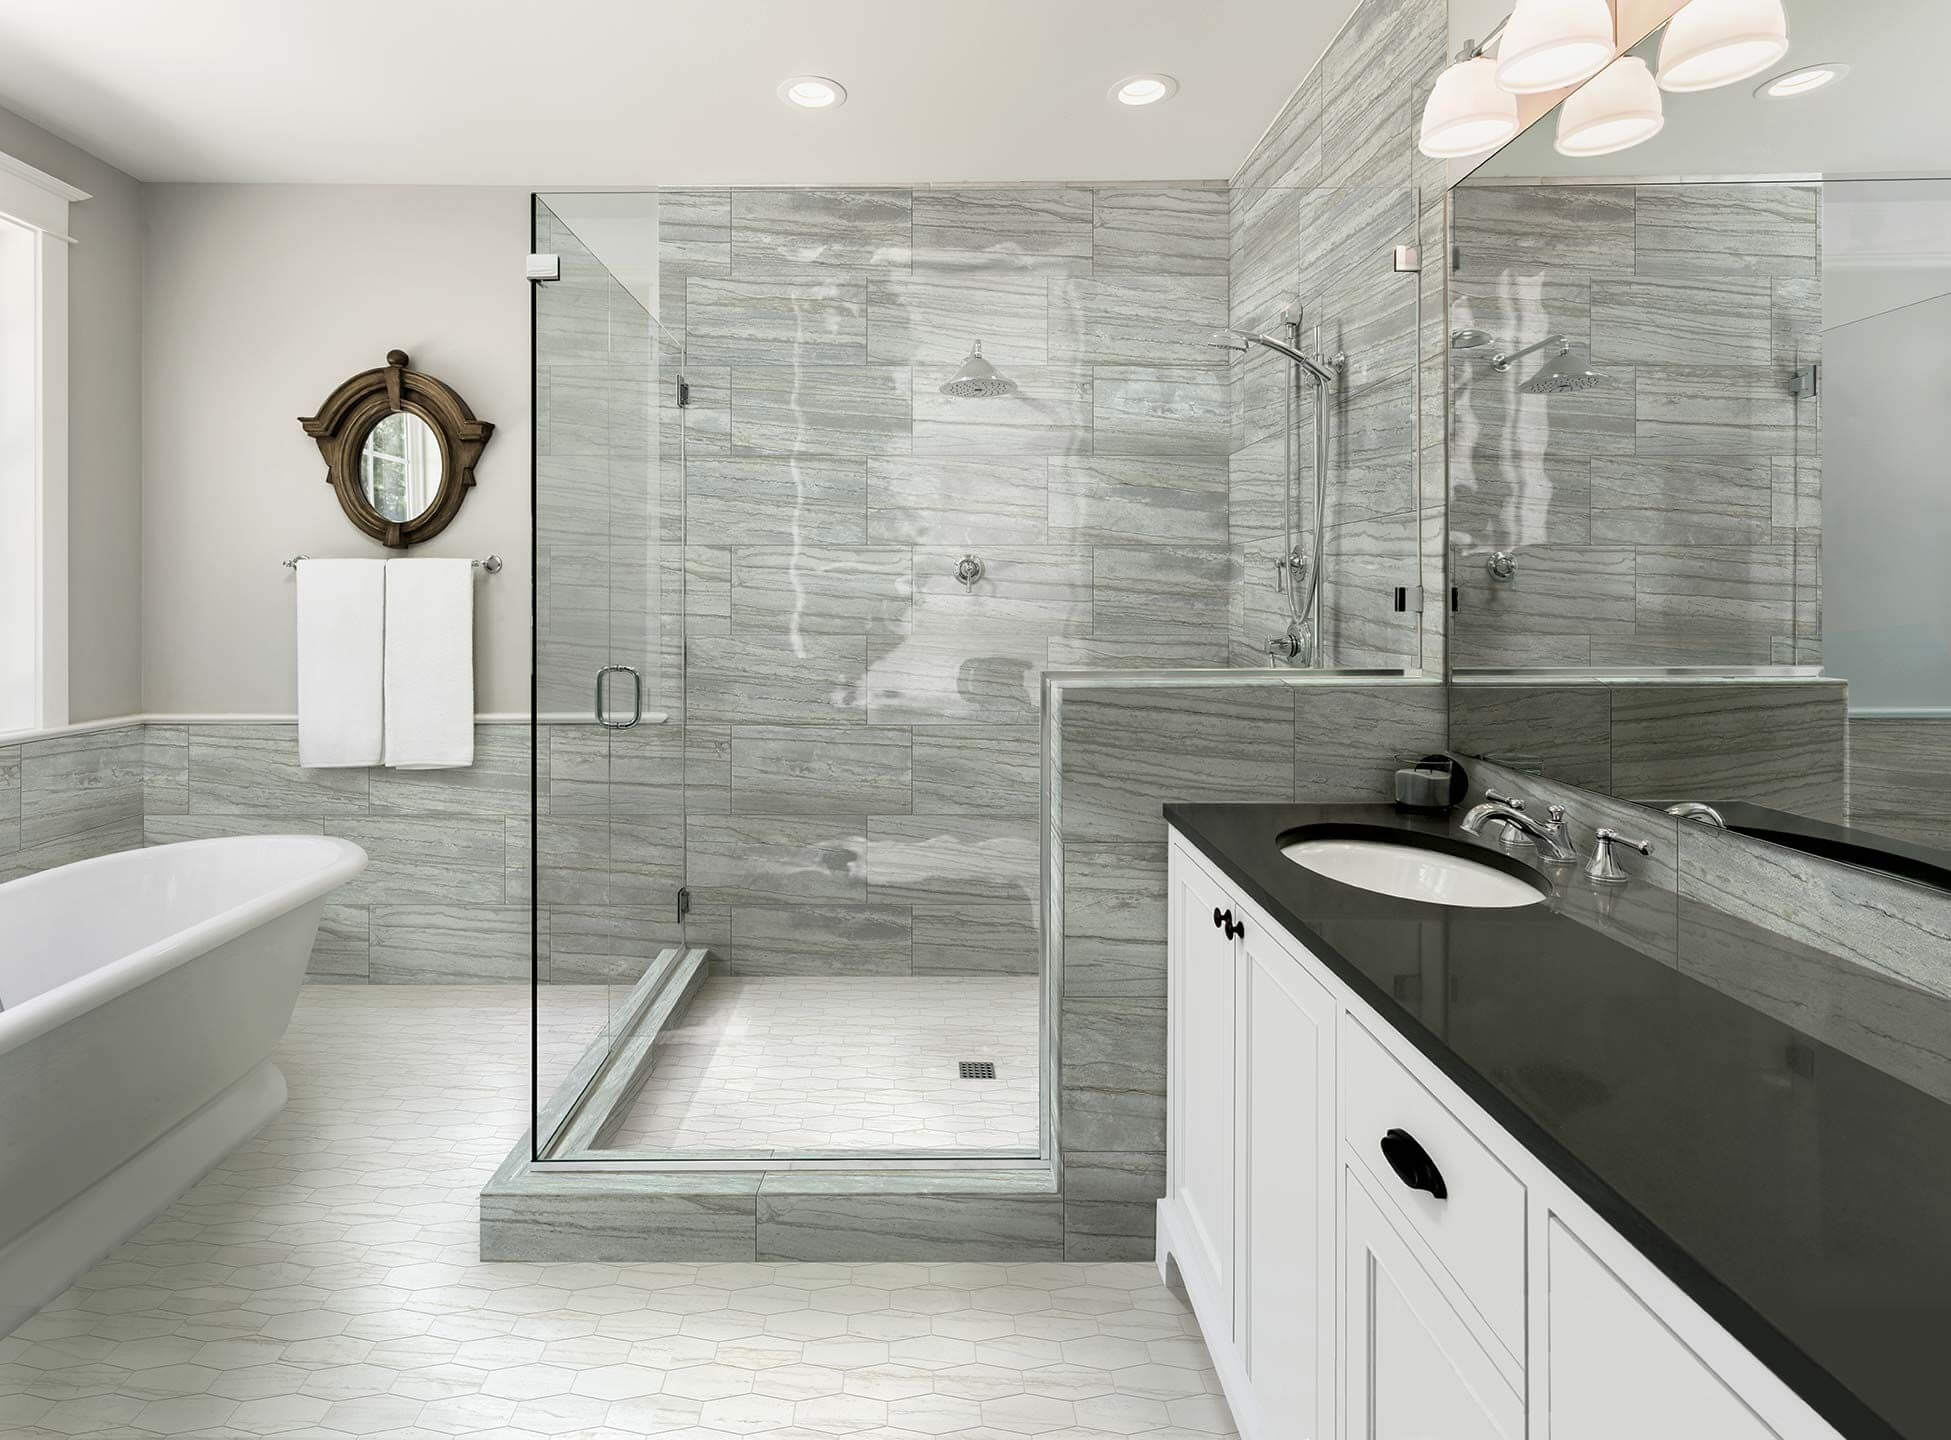 Bathroom Tiles Design: Renovate with Latest Bathroom Wall Tiles